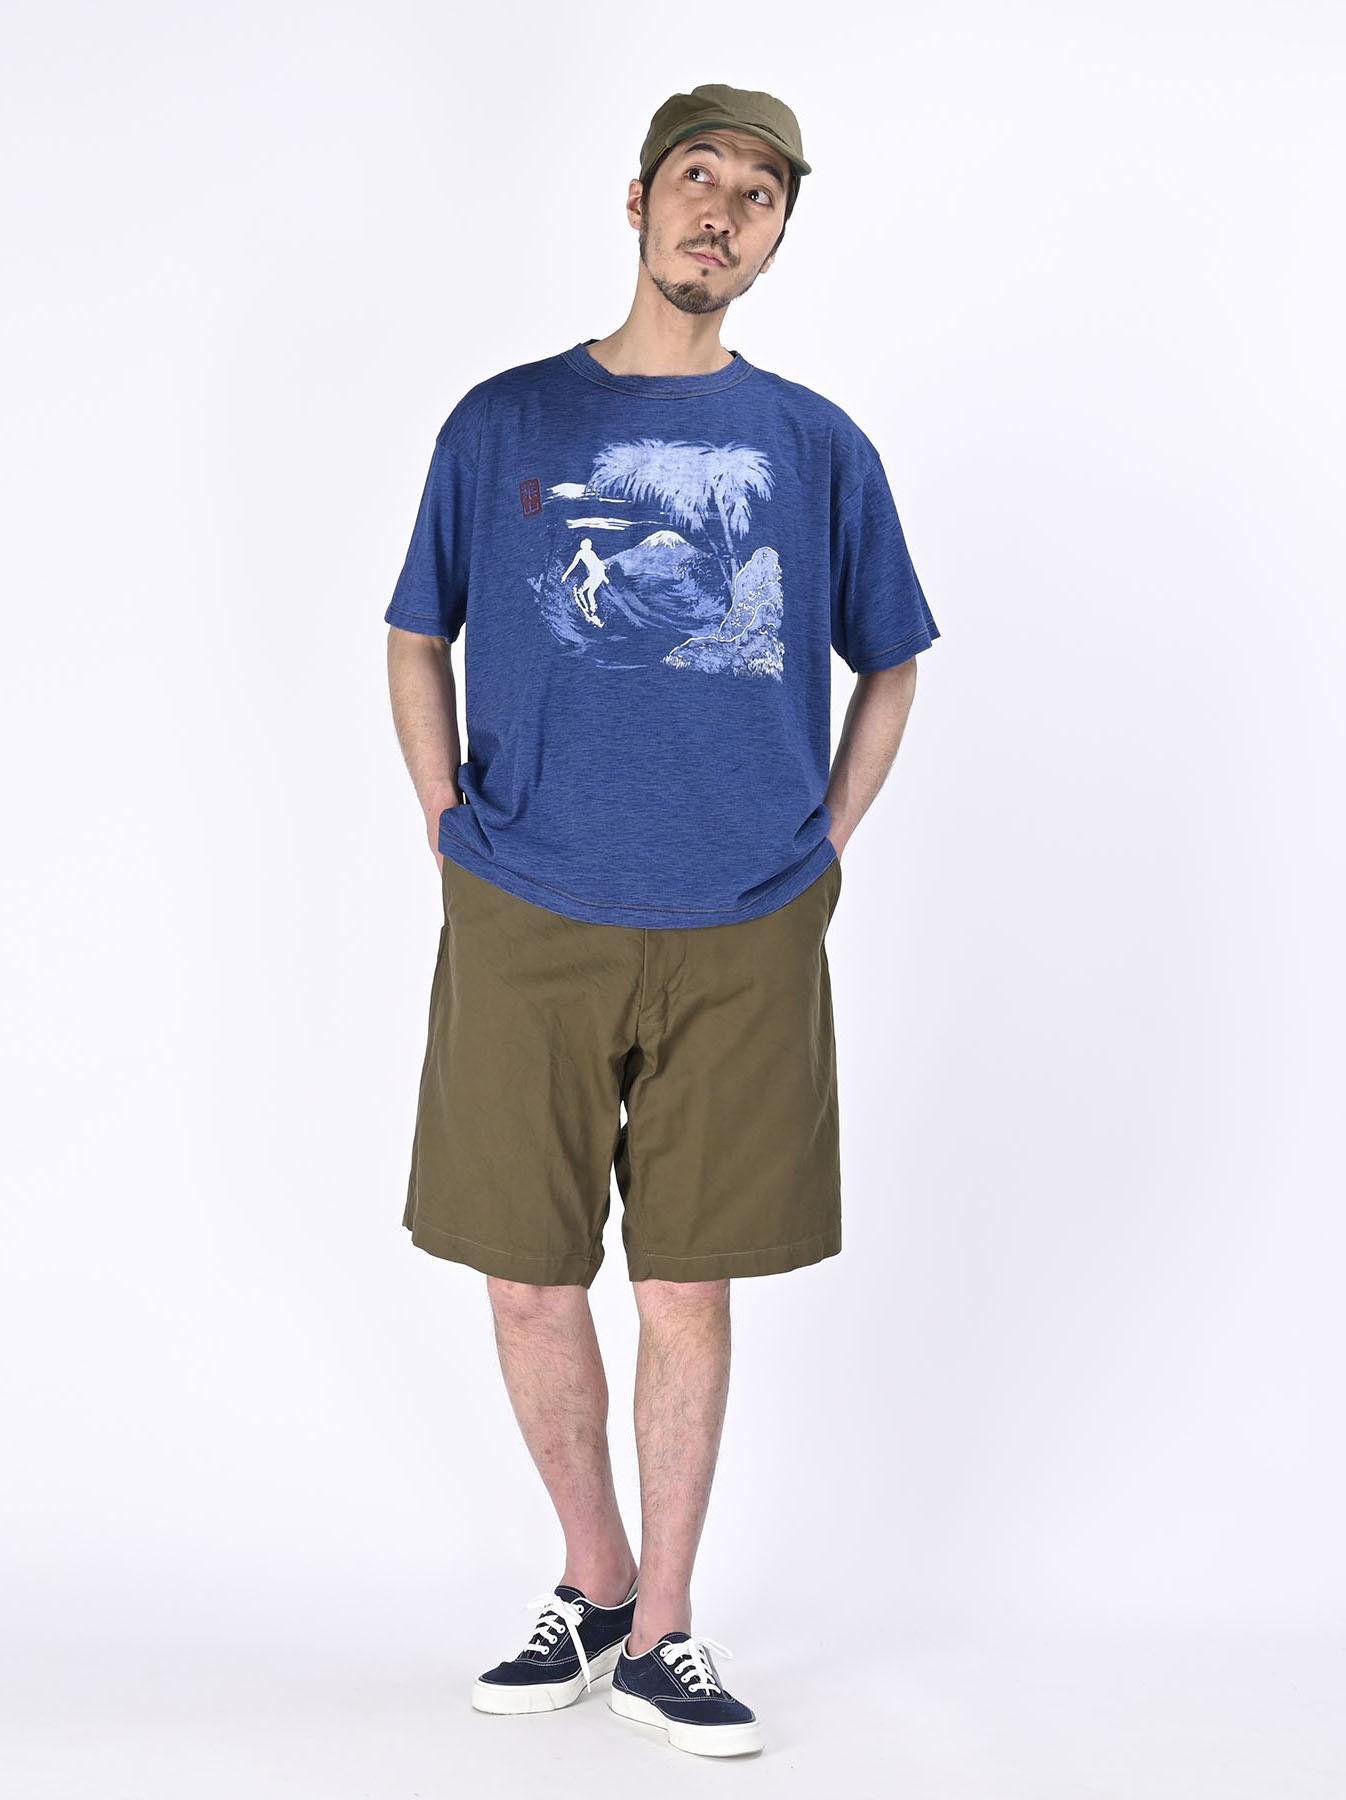 Distressed Indigo Ukiyo de Surf 908 Ocean T-shirt (0621)-2